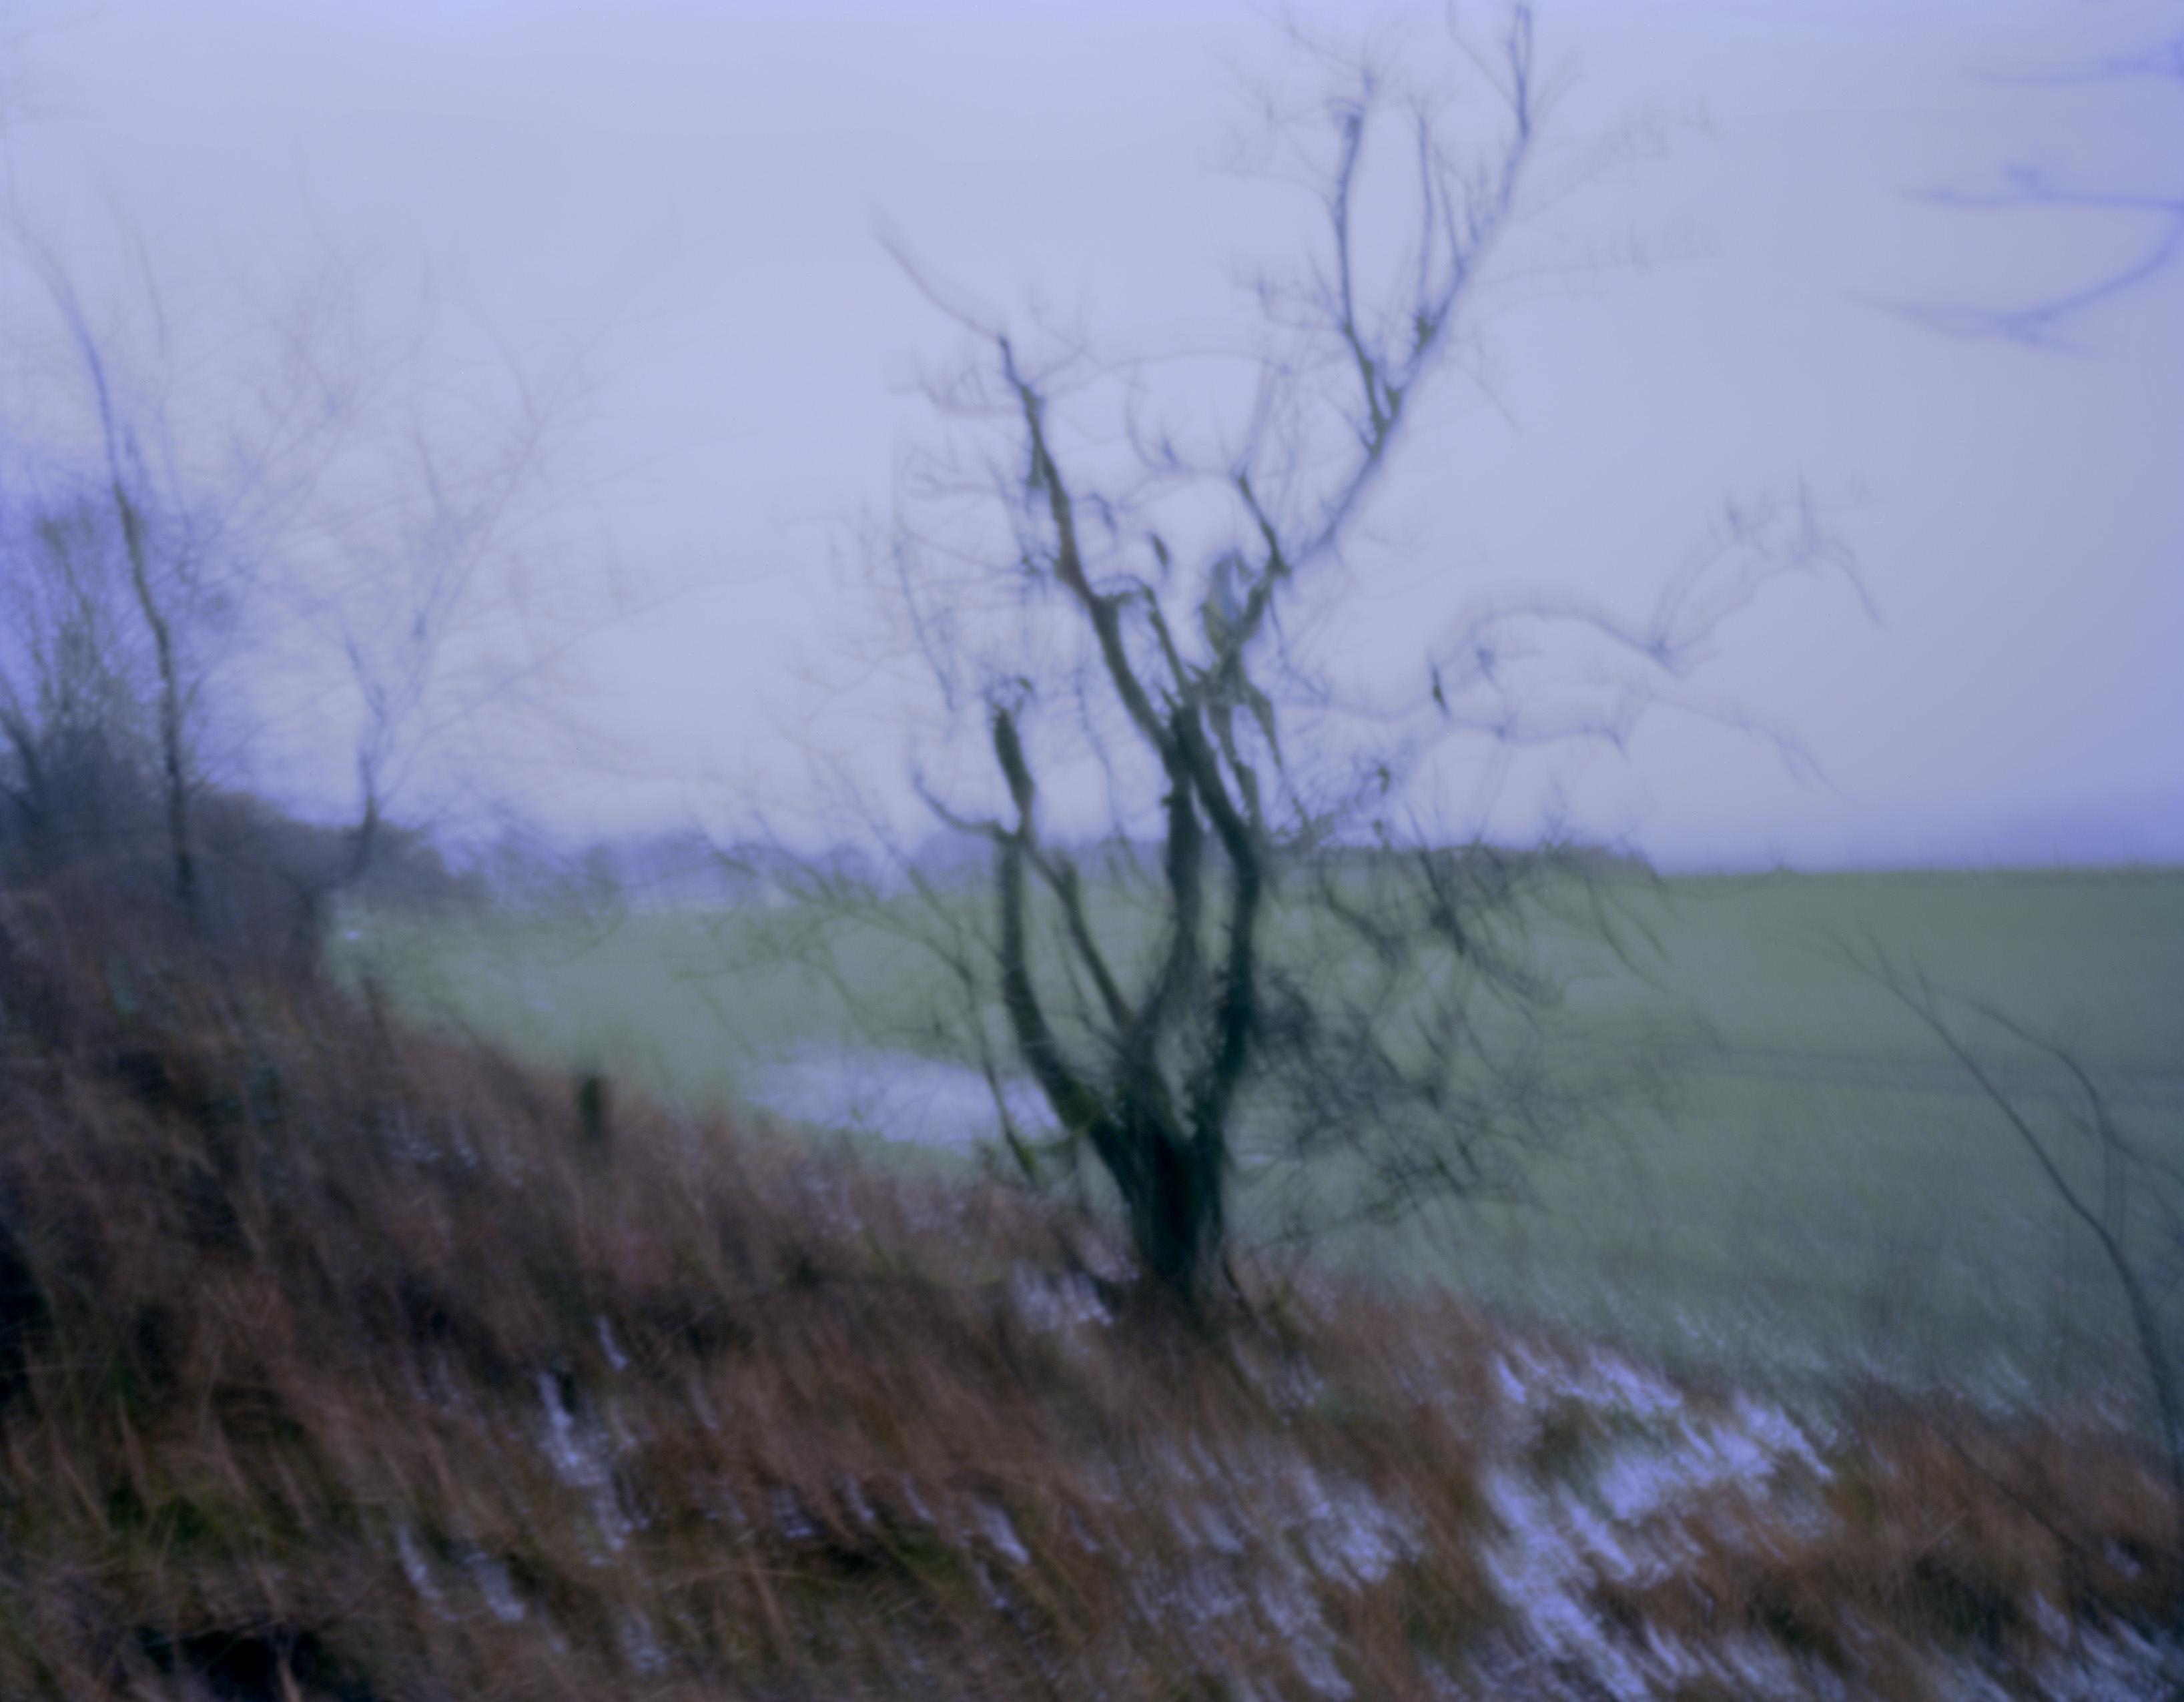 Pinhole photography image of a field with a close up leafless tree. Image by Simon McAuley